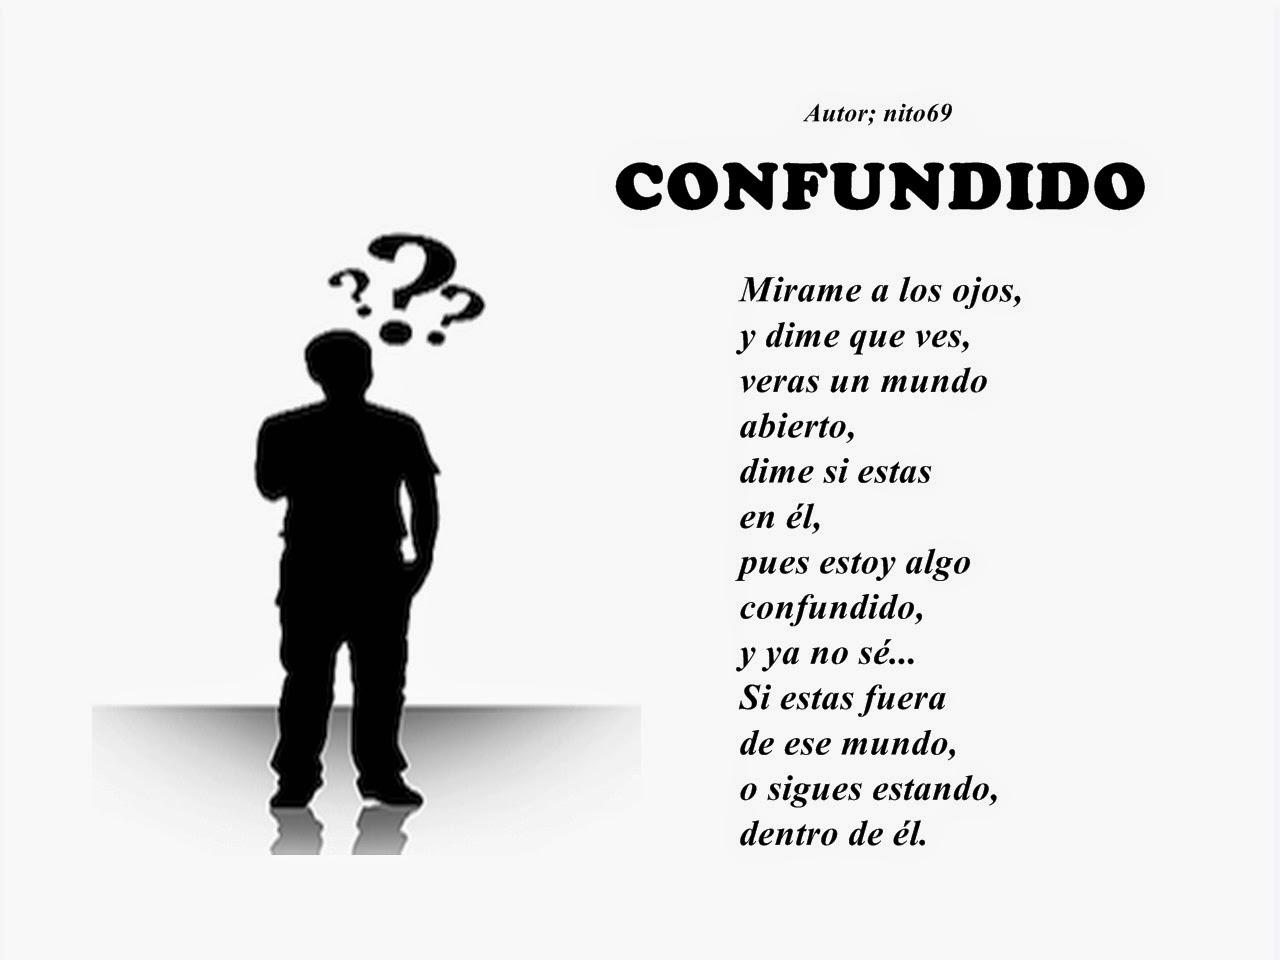 CONFUNDIDO